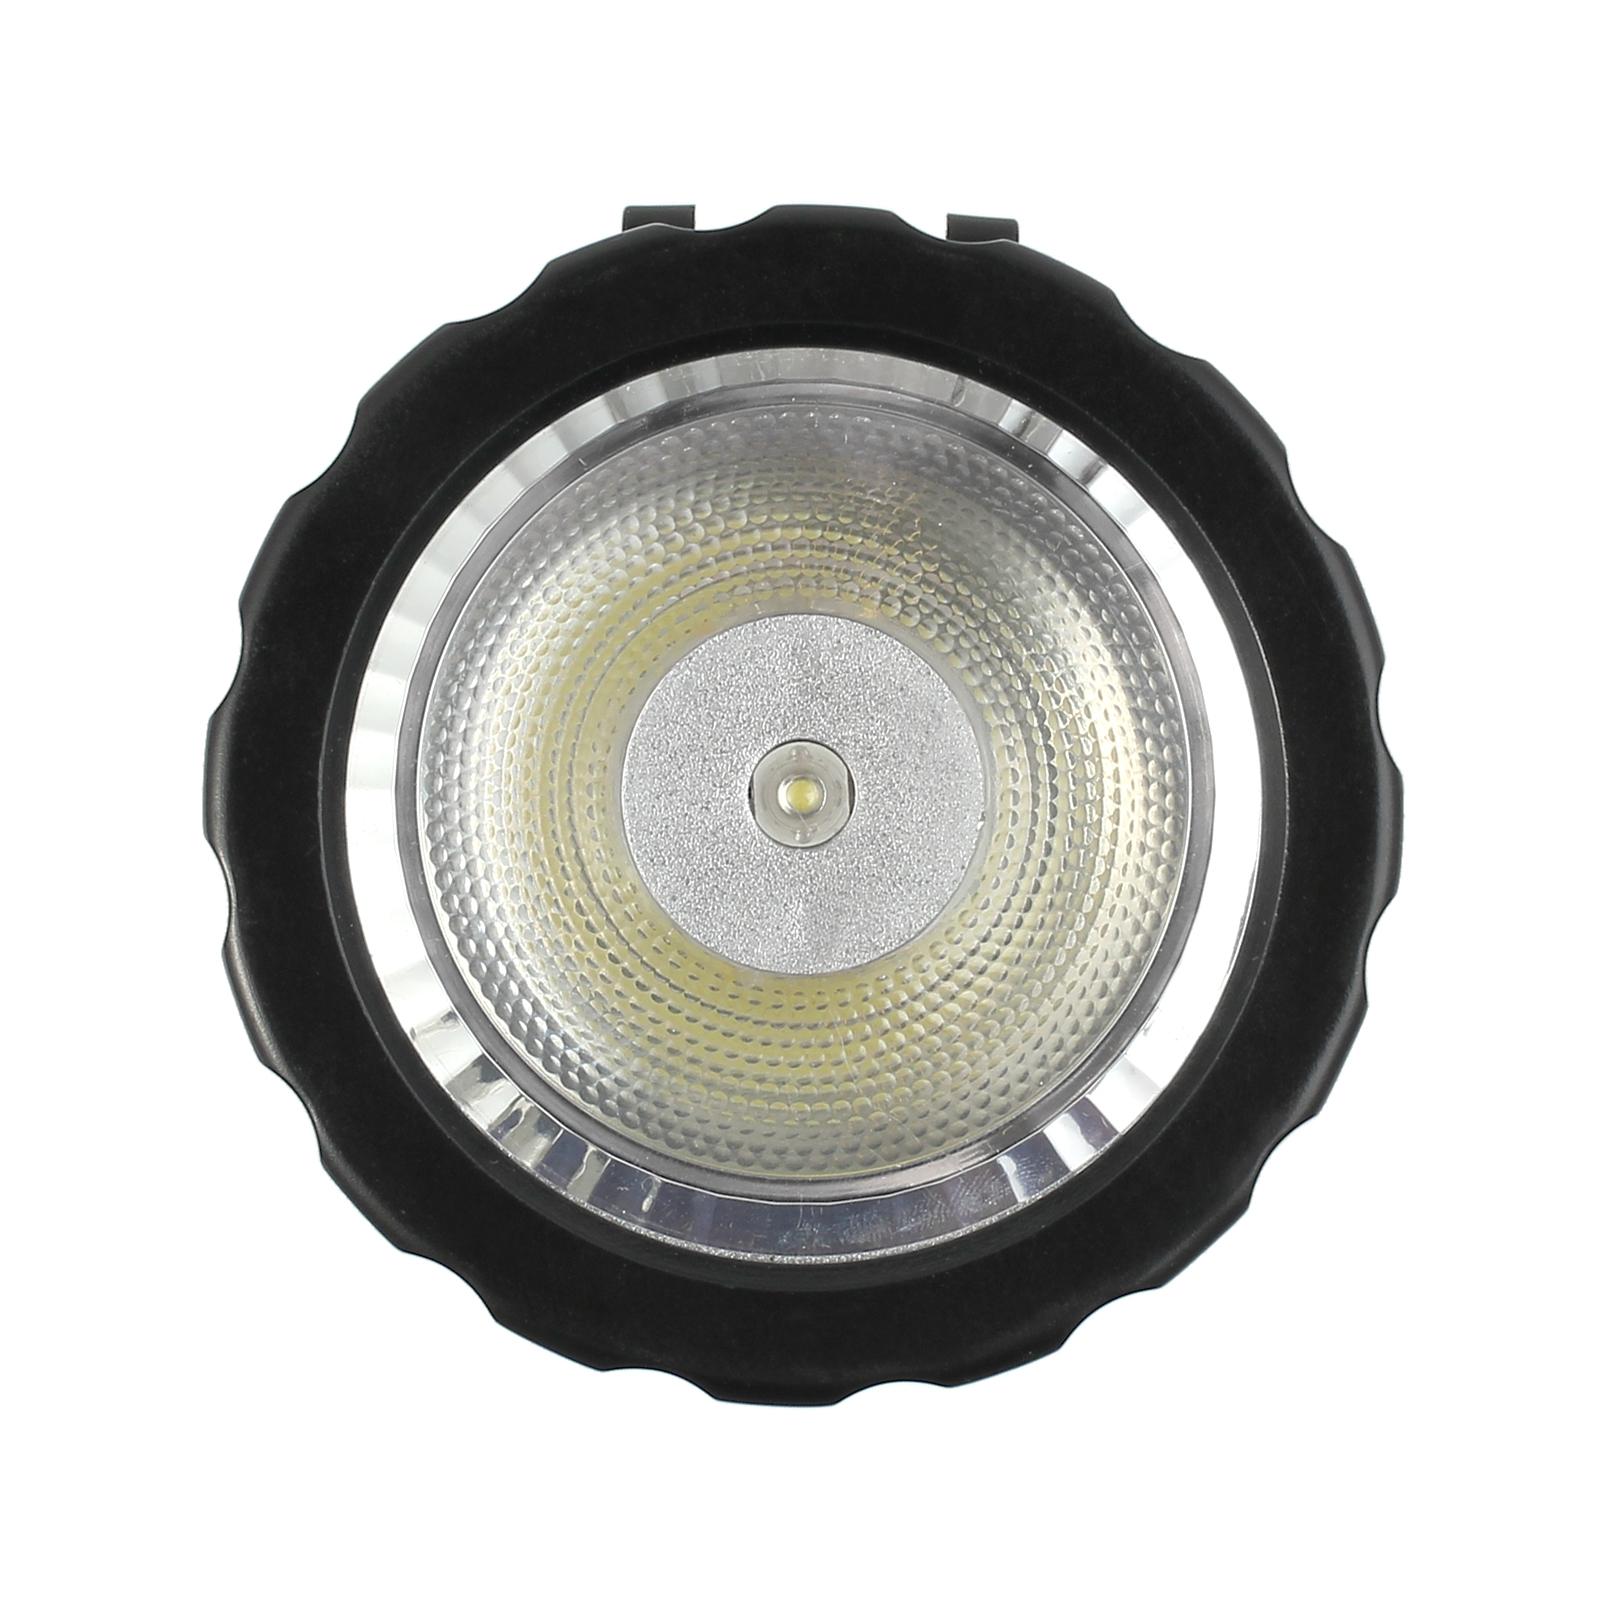 2pcs Ultra Bright 60 LED Outdoor Camping Tent Light Lantern Hiking Fishing Lamp